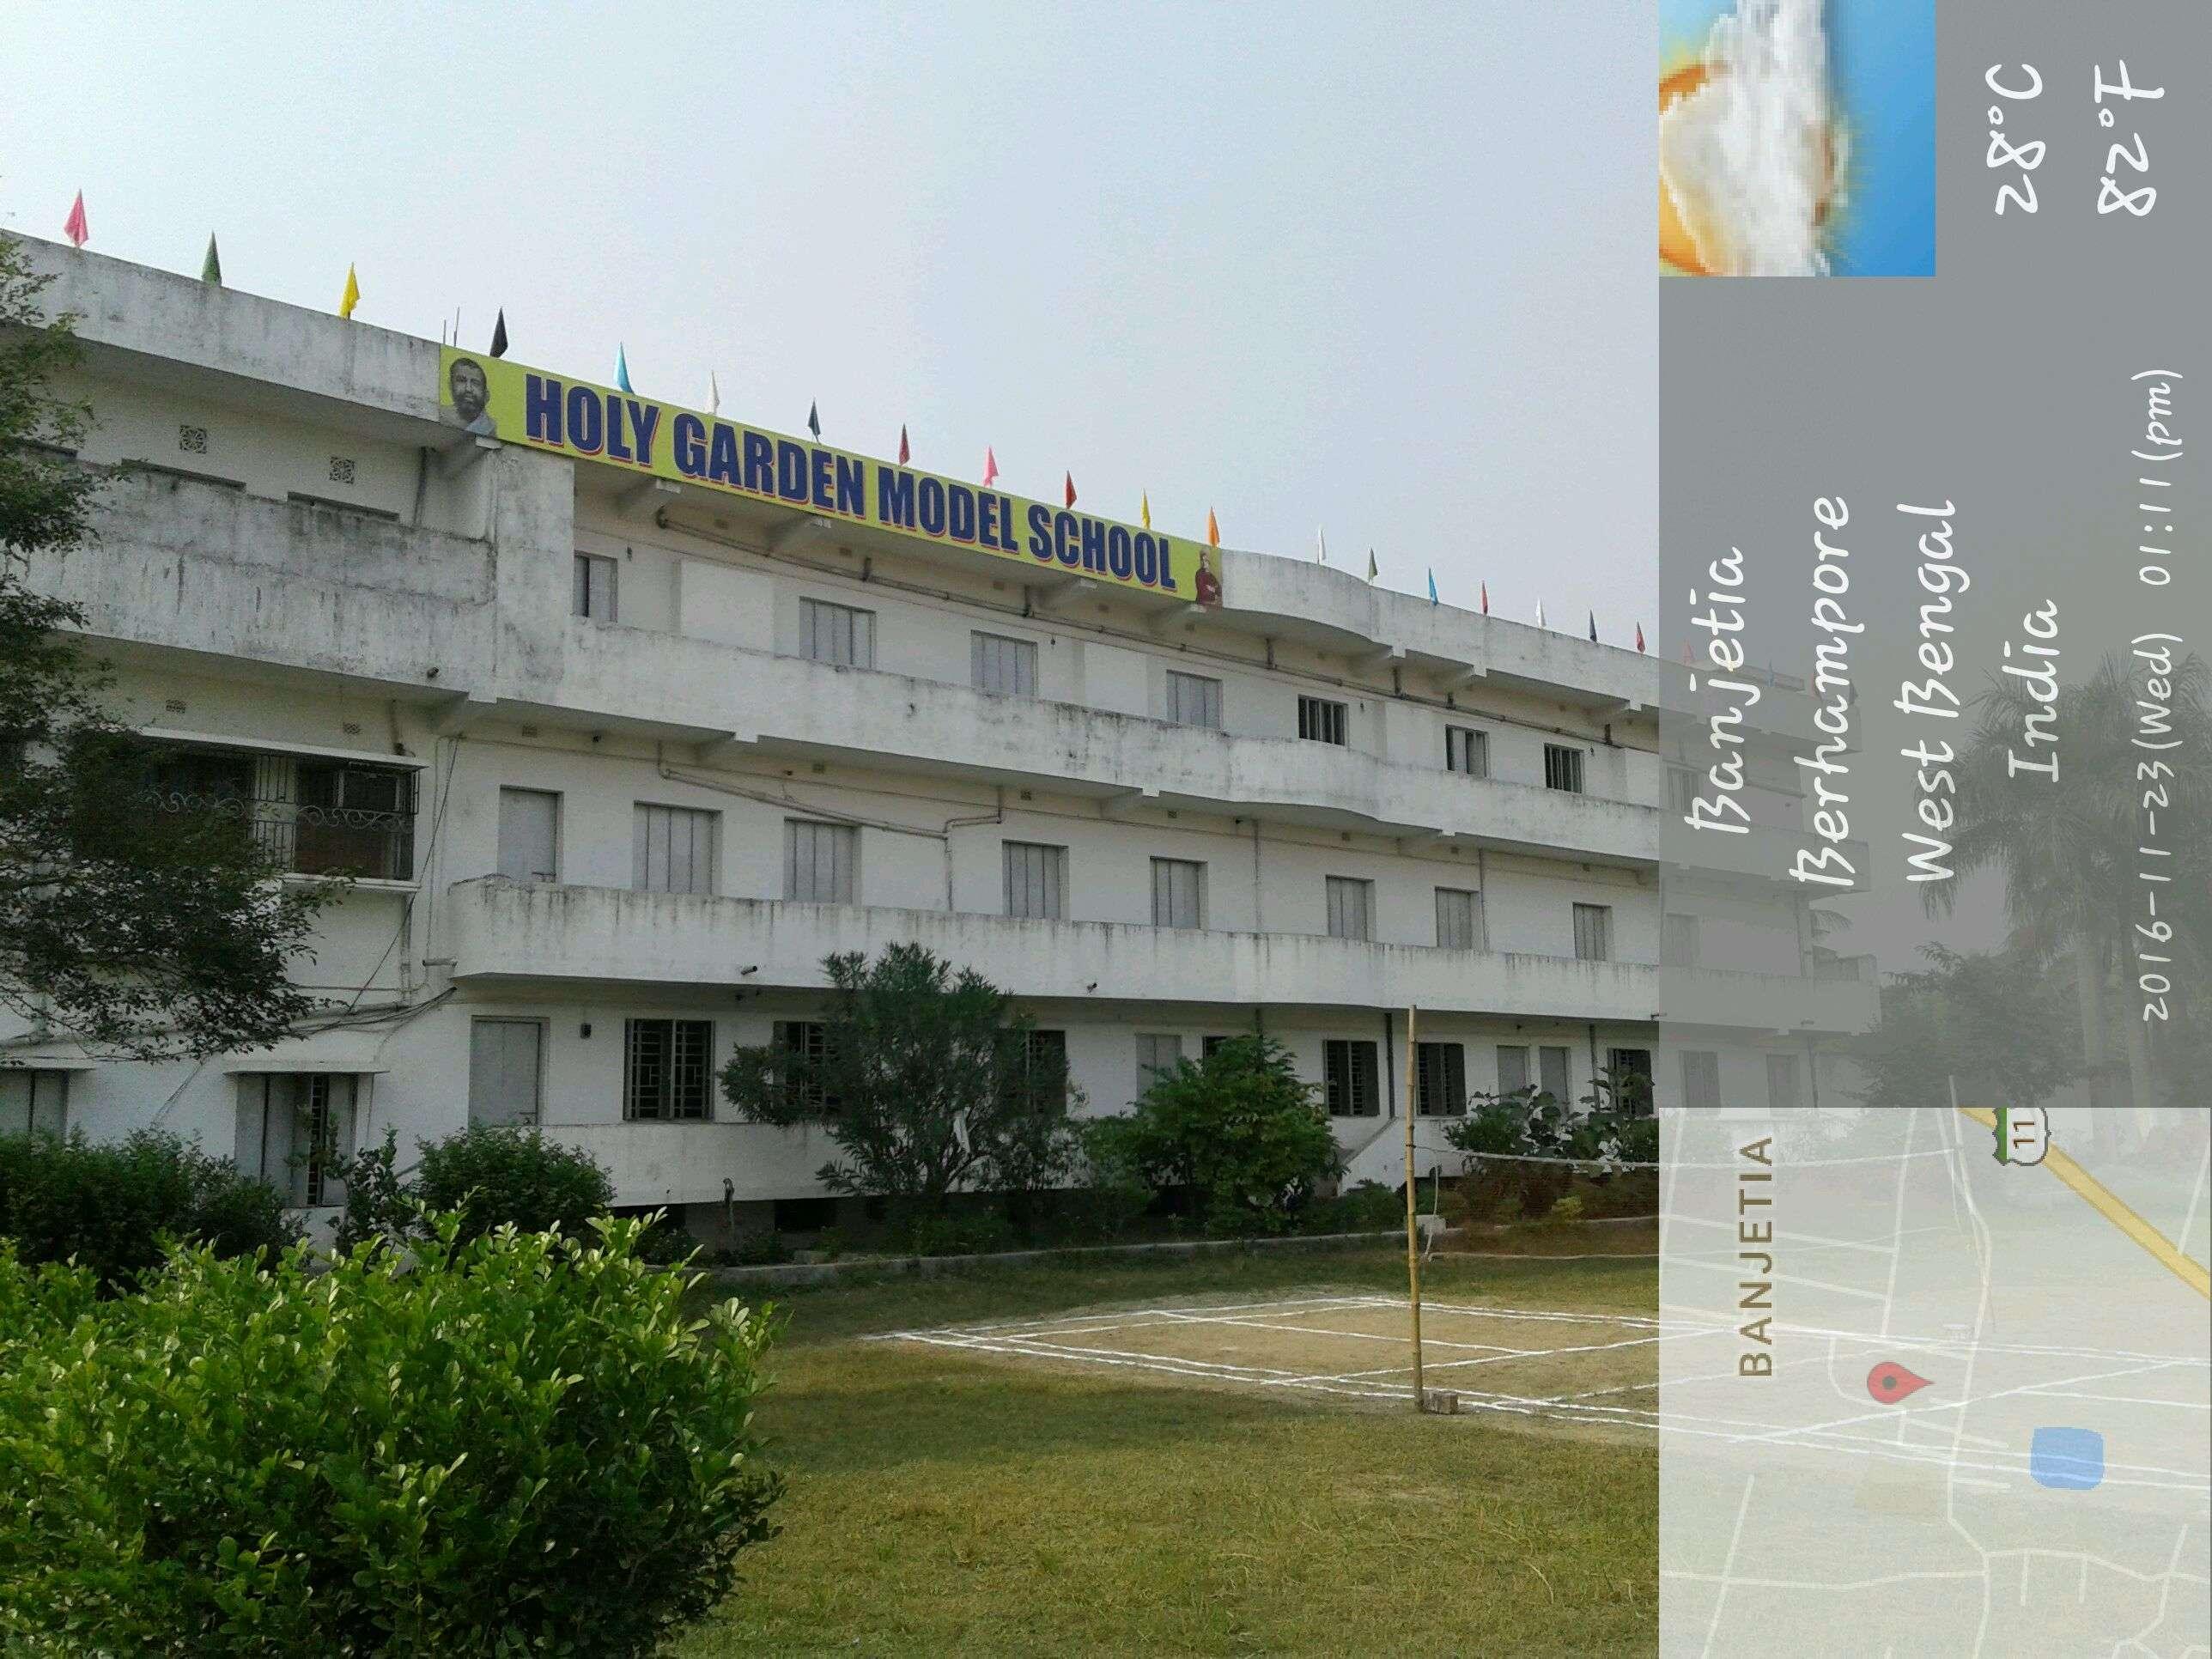 Holy Garden Model school 2 Banjetia P O BanjetiaBerhampore Murshidabad 2430112